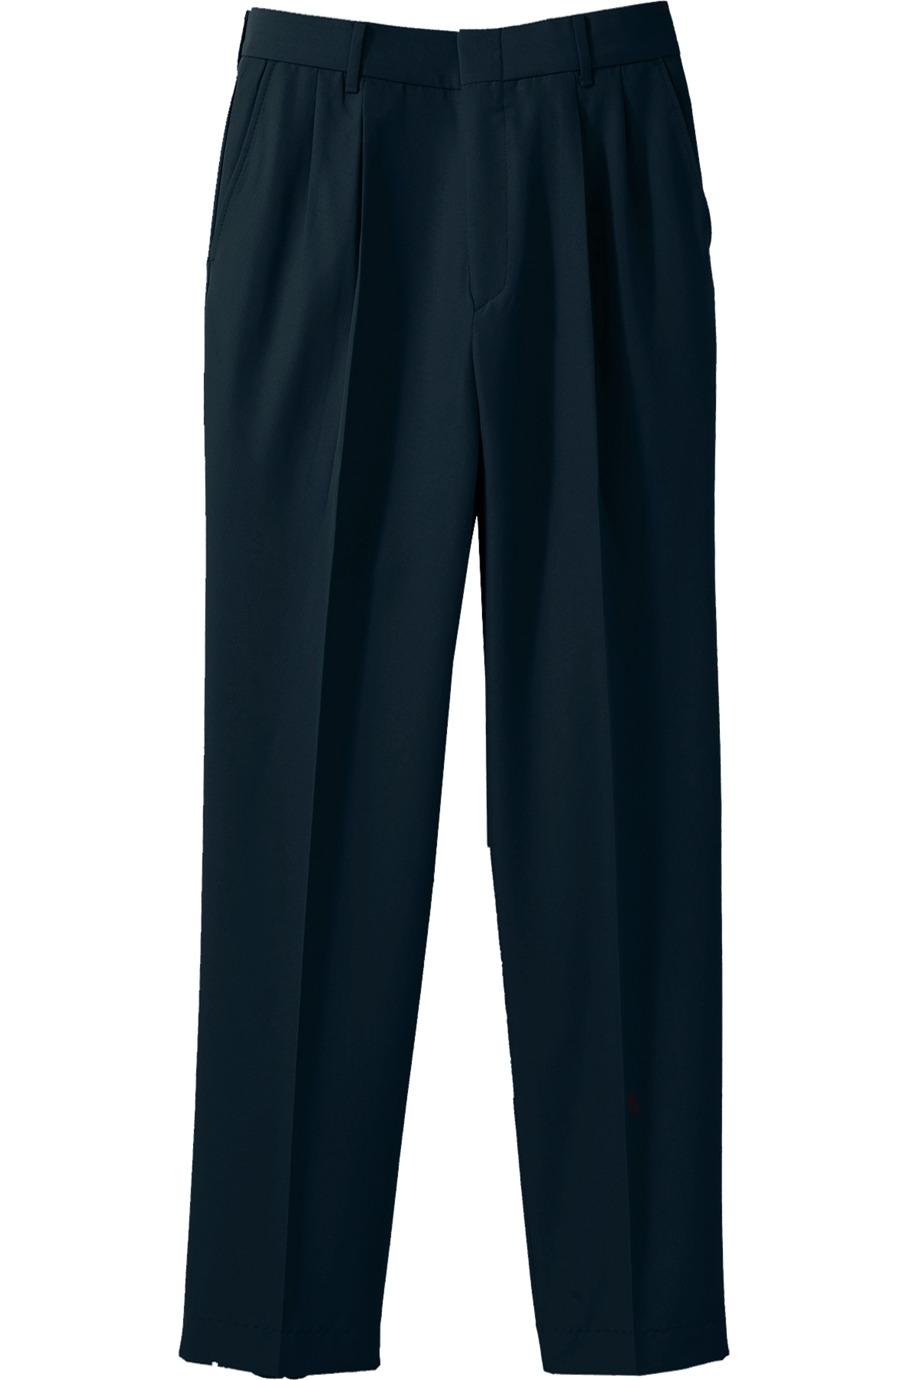 Edwards Garment 2620 - Men's Washable Wool Blend Pleated Pant